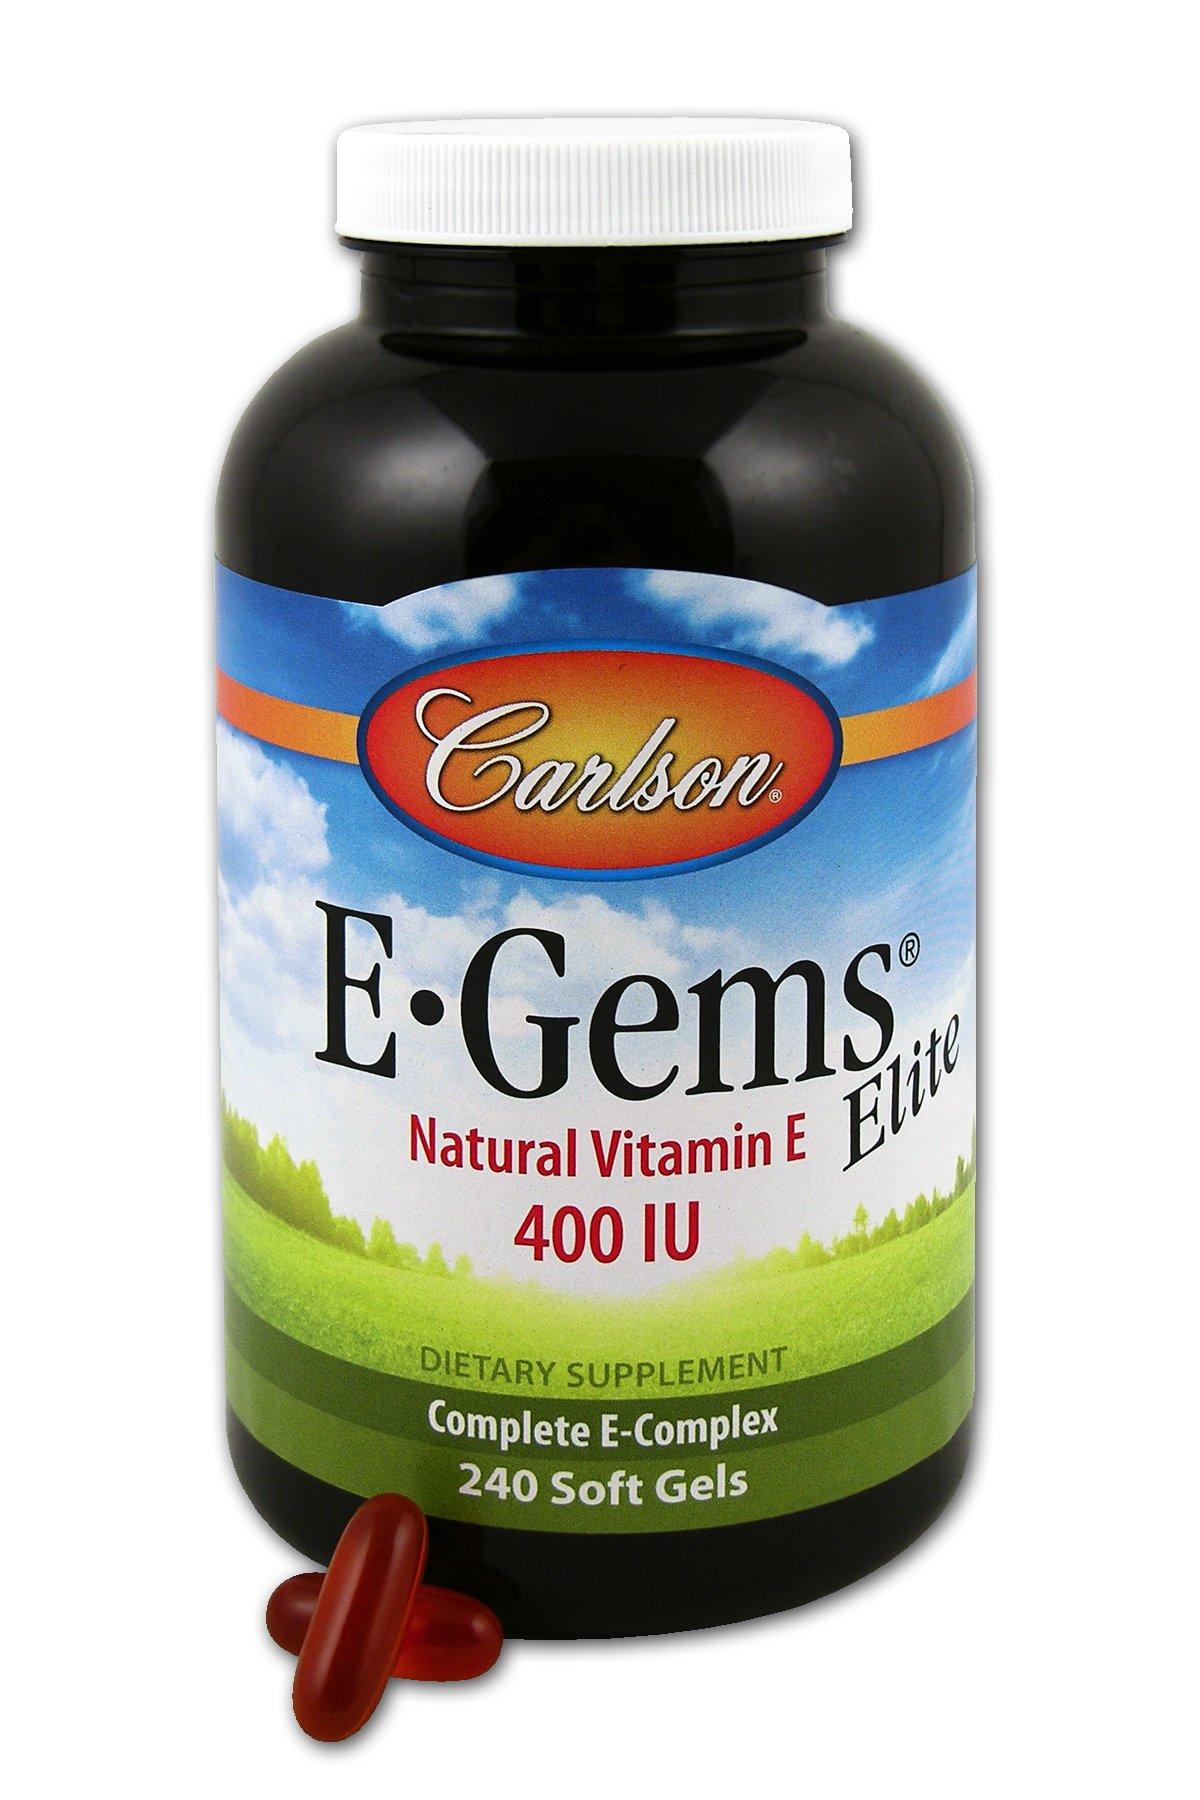 Carlson Labs E-Gems Natural Vitamin E Elite, 400 IU, 240 Softgels